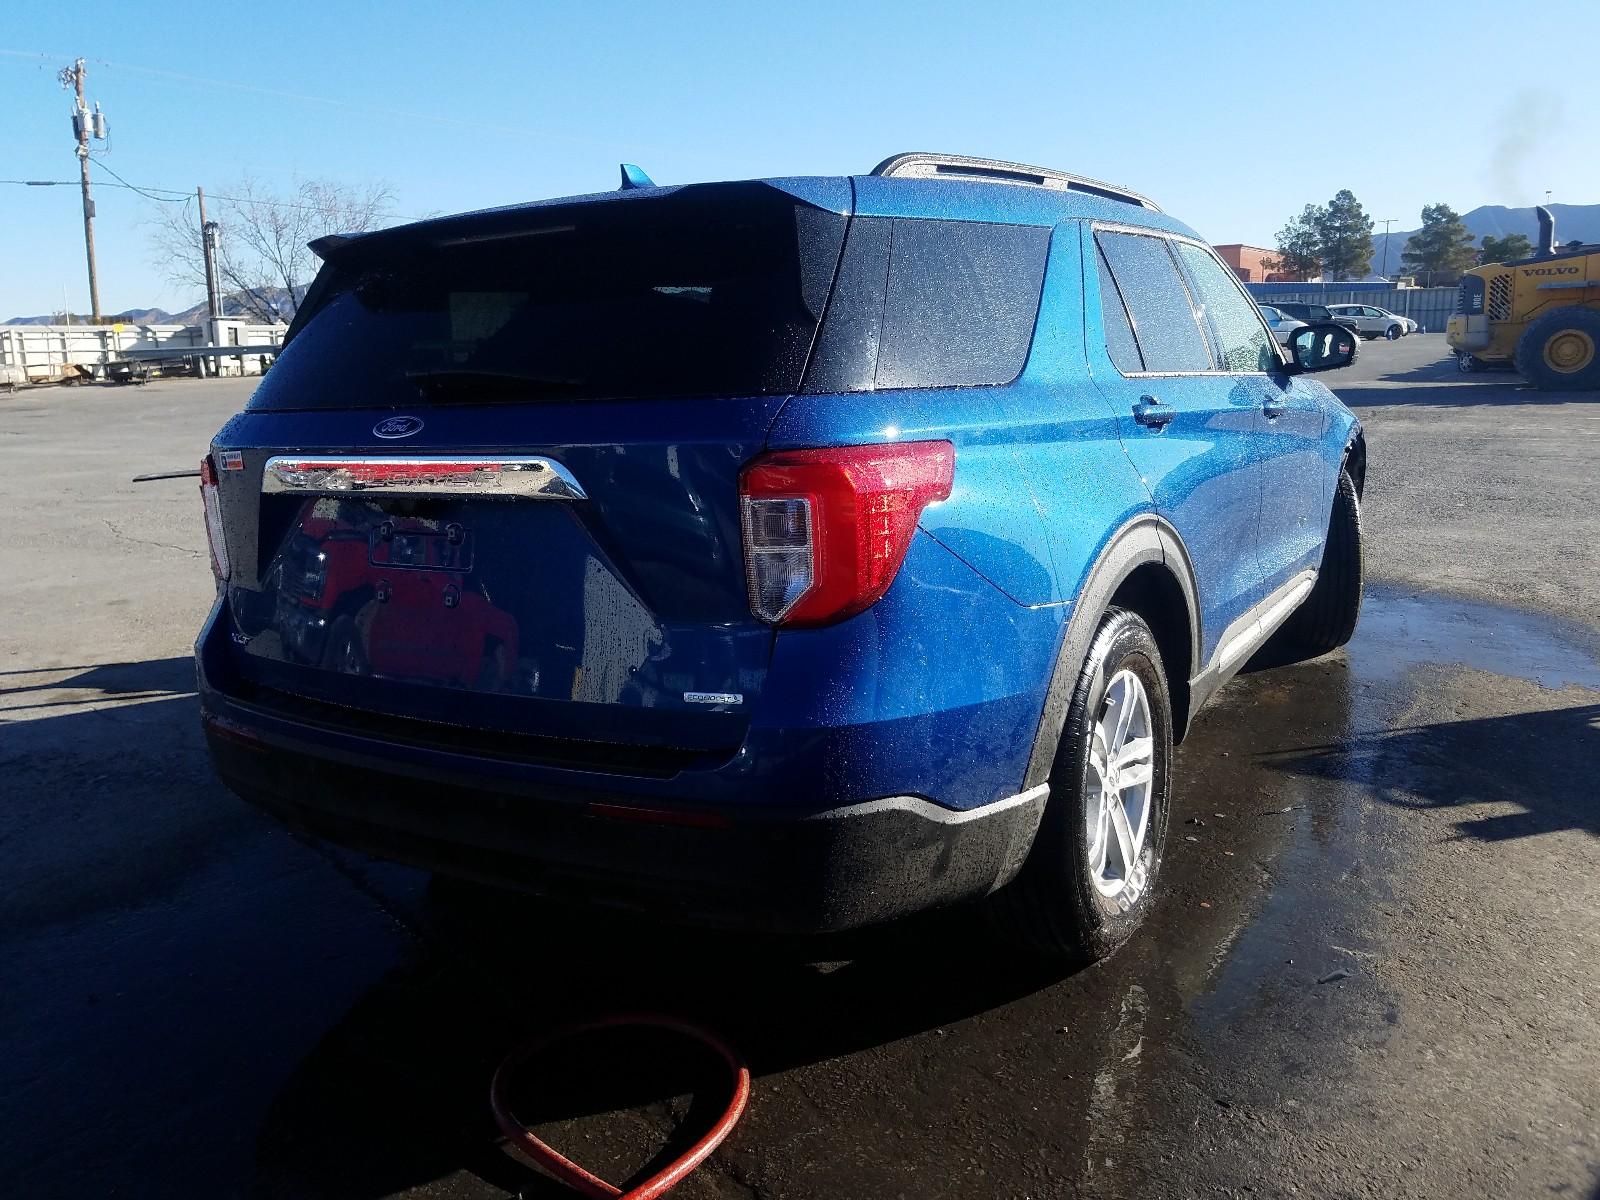 1FMSK7DH1LGB15824 - 2020 Ford Explorer X 2.3L rear view